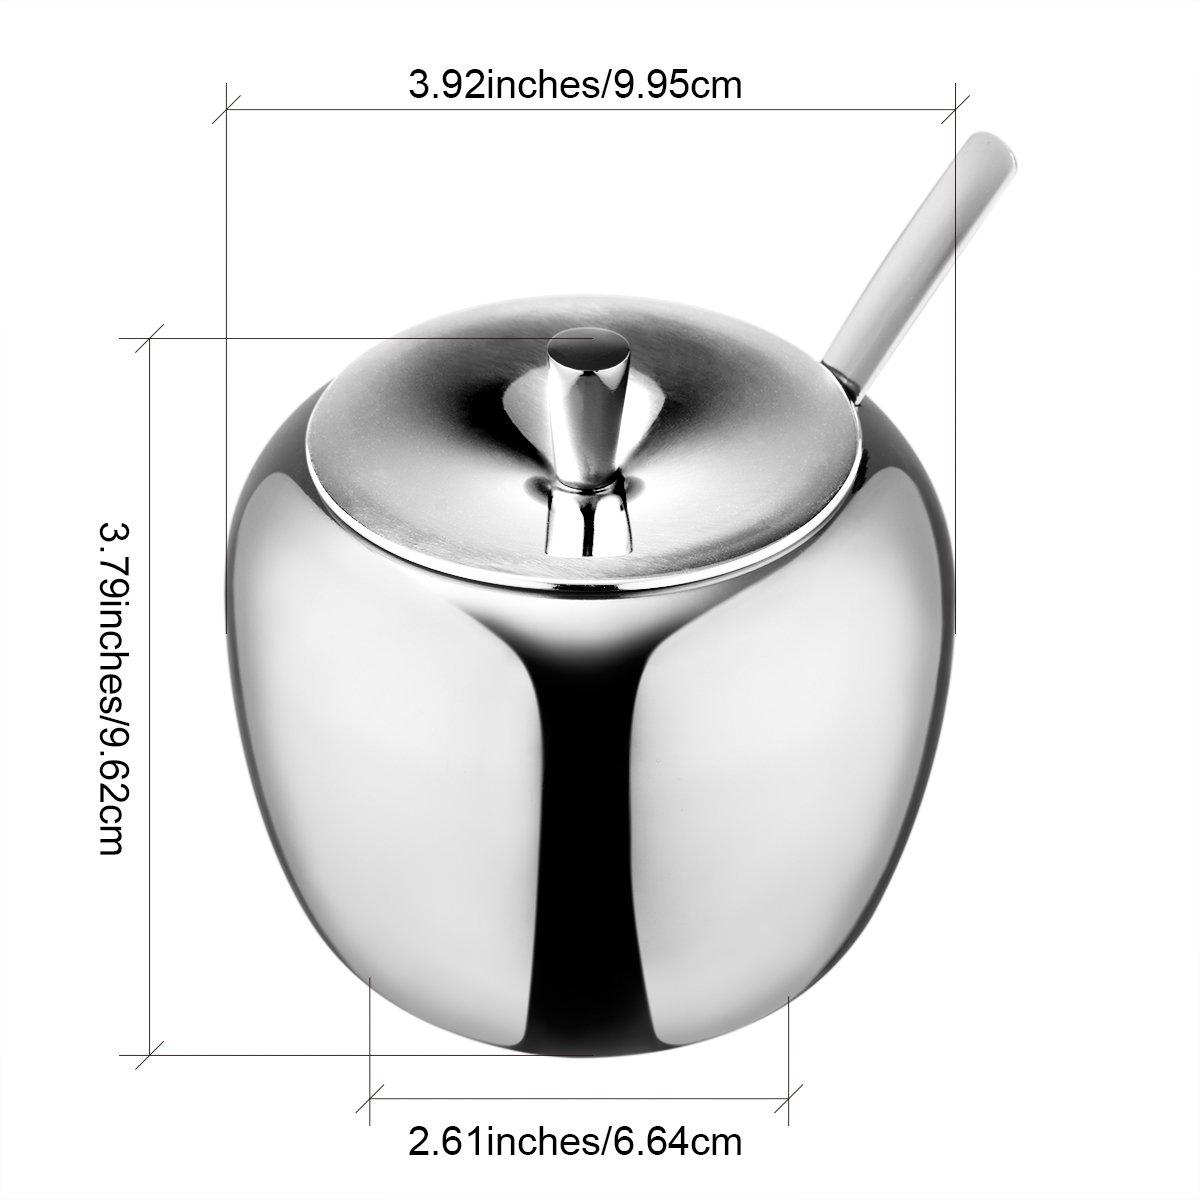 amazoncom  hardnok stainless steel sugar bowl with lid and sugar  - amazoncom  hardnok stainless steel sugar bowl with lid and sugar spoon ounces ( milliliter) sugar bowls